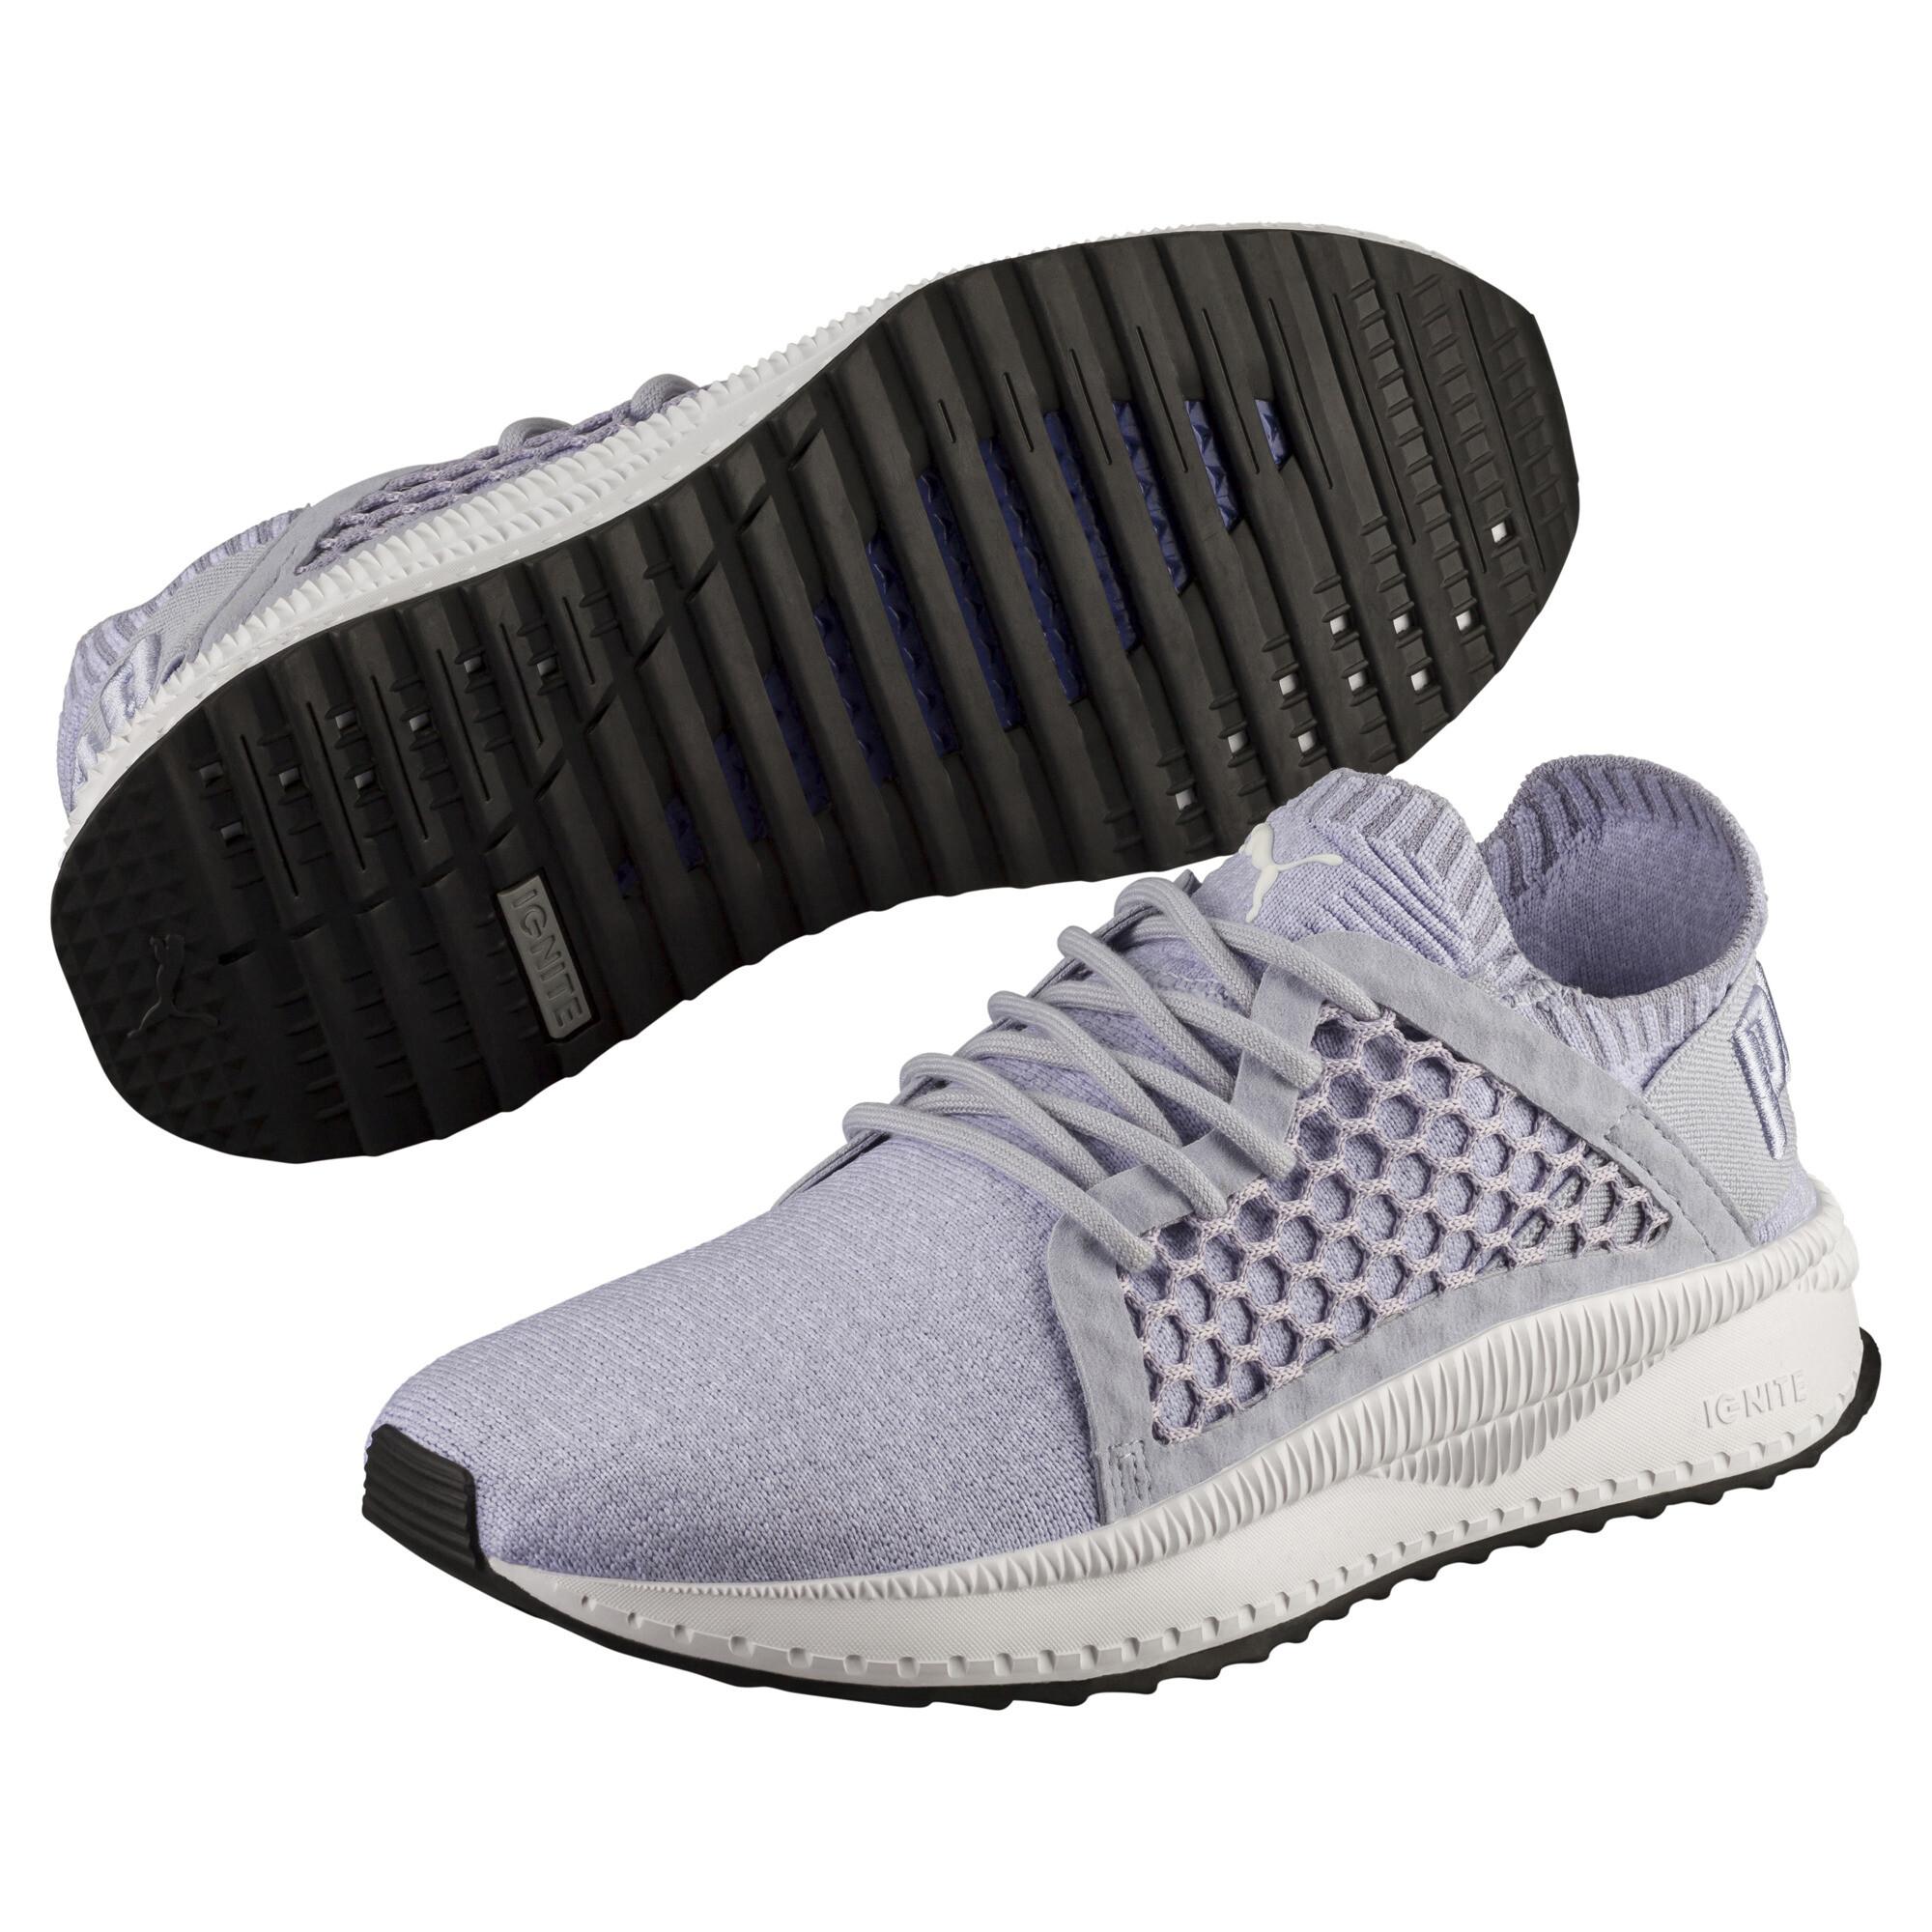 PUMA-TSUGI-NETFIT-evoKNIT-Sneaker-Frauen-Schuhe-Neu Indexbild 7